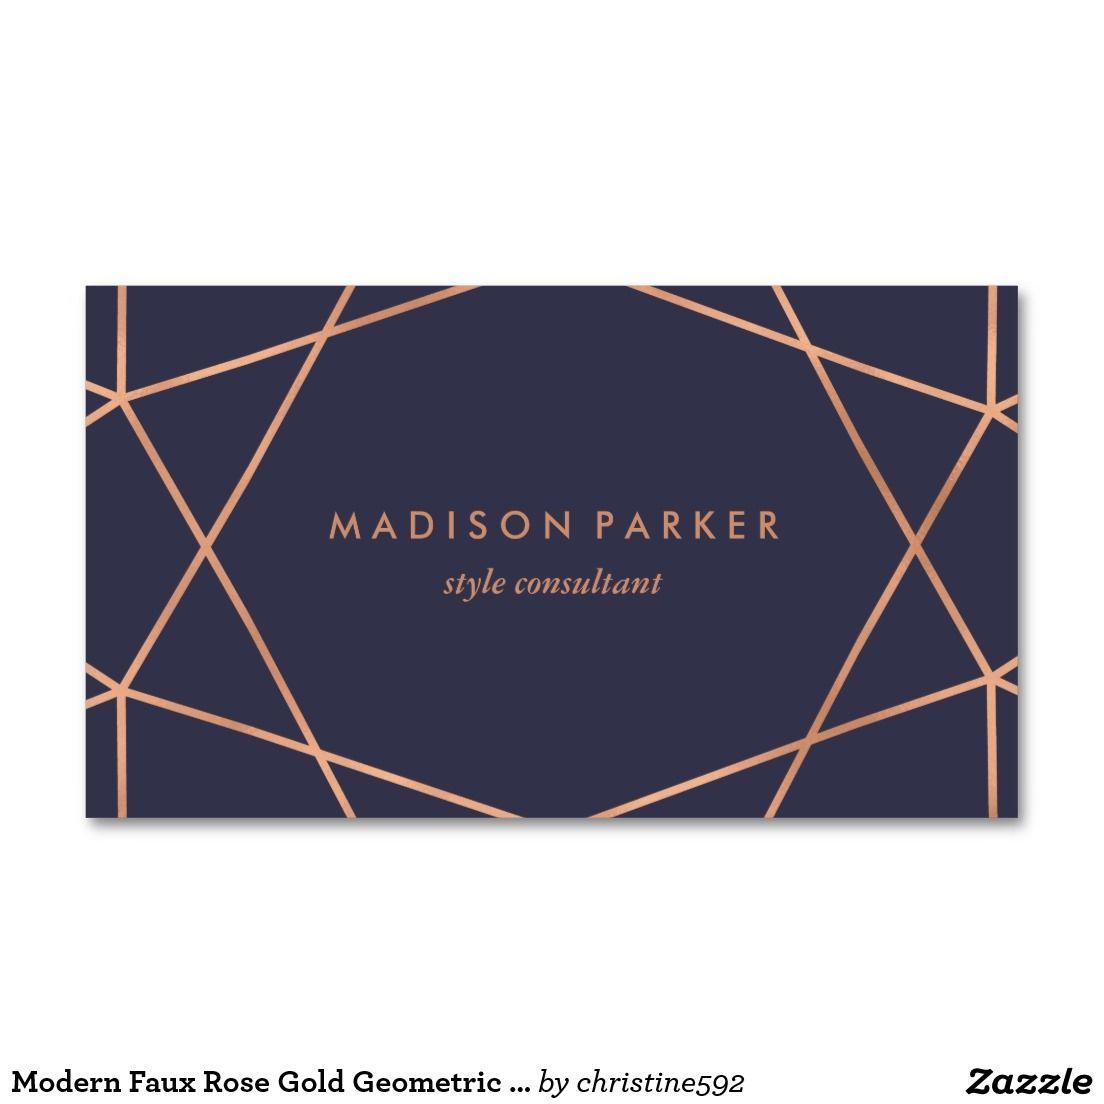 Bleu Nuit Modern Faux Rose Gold Geometric On Midnight Blue Business Card Carte De Visite Affaires